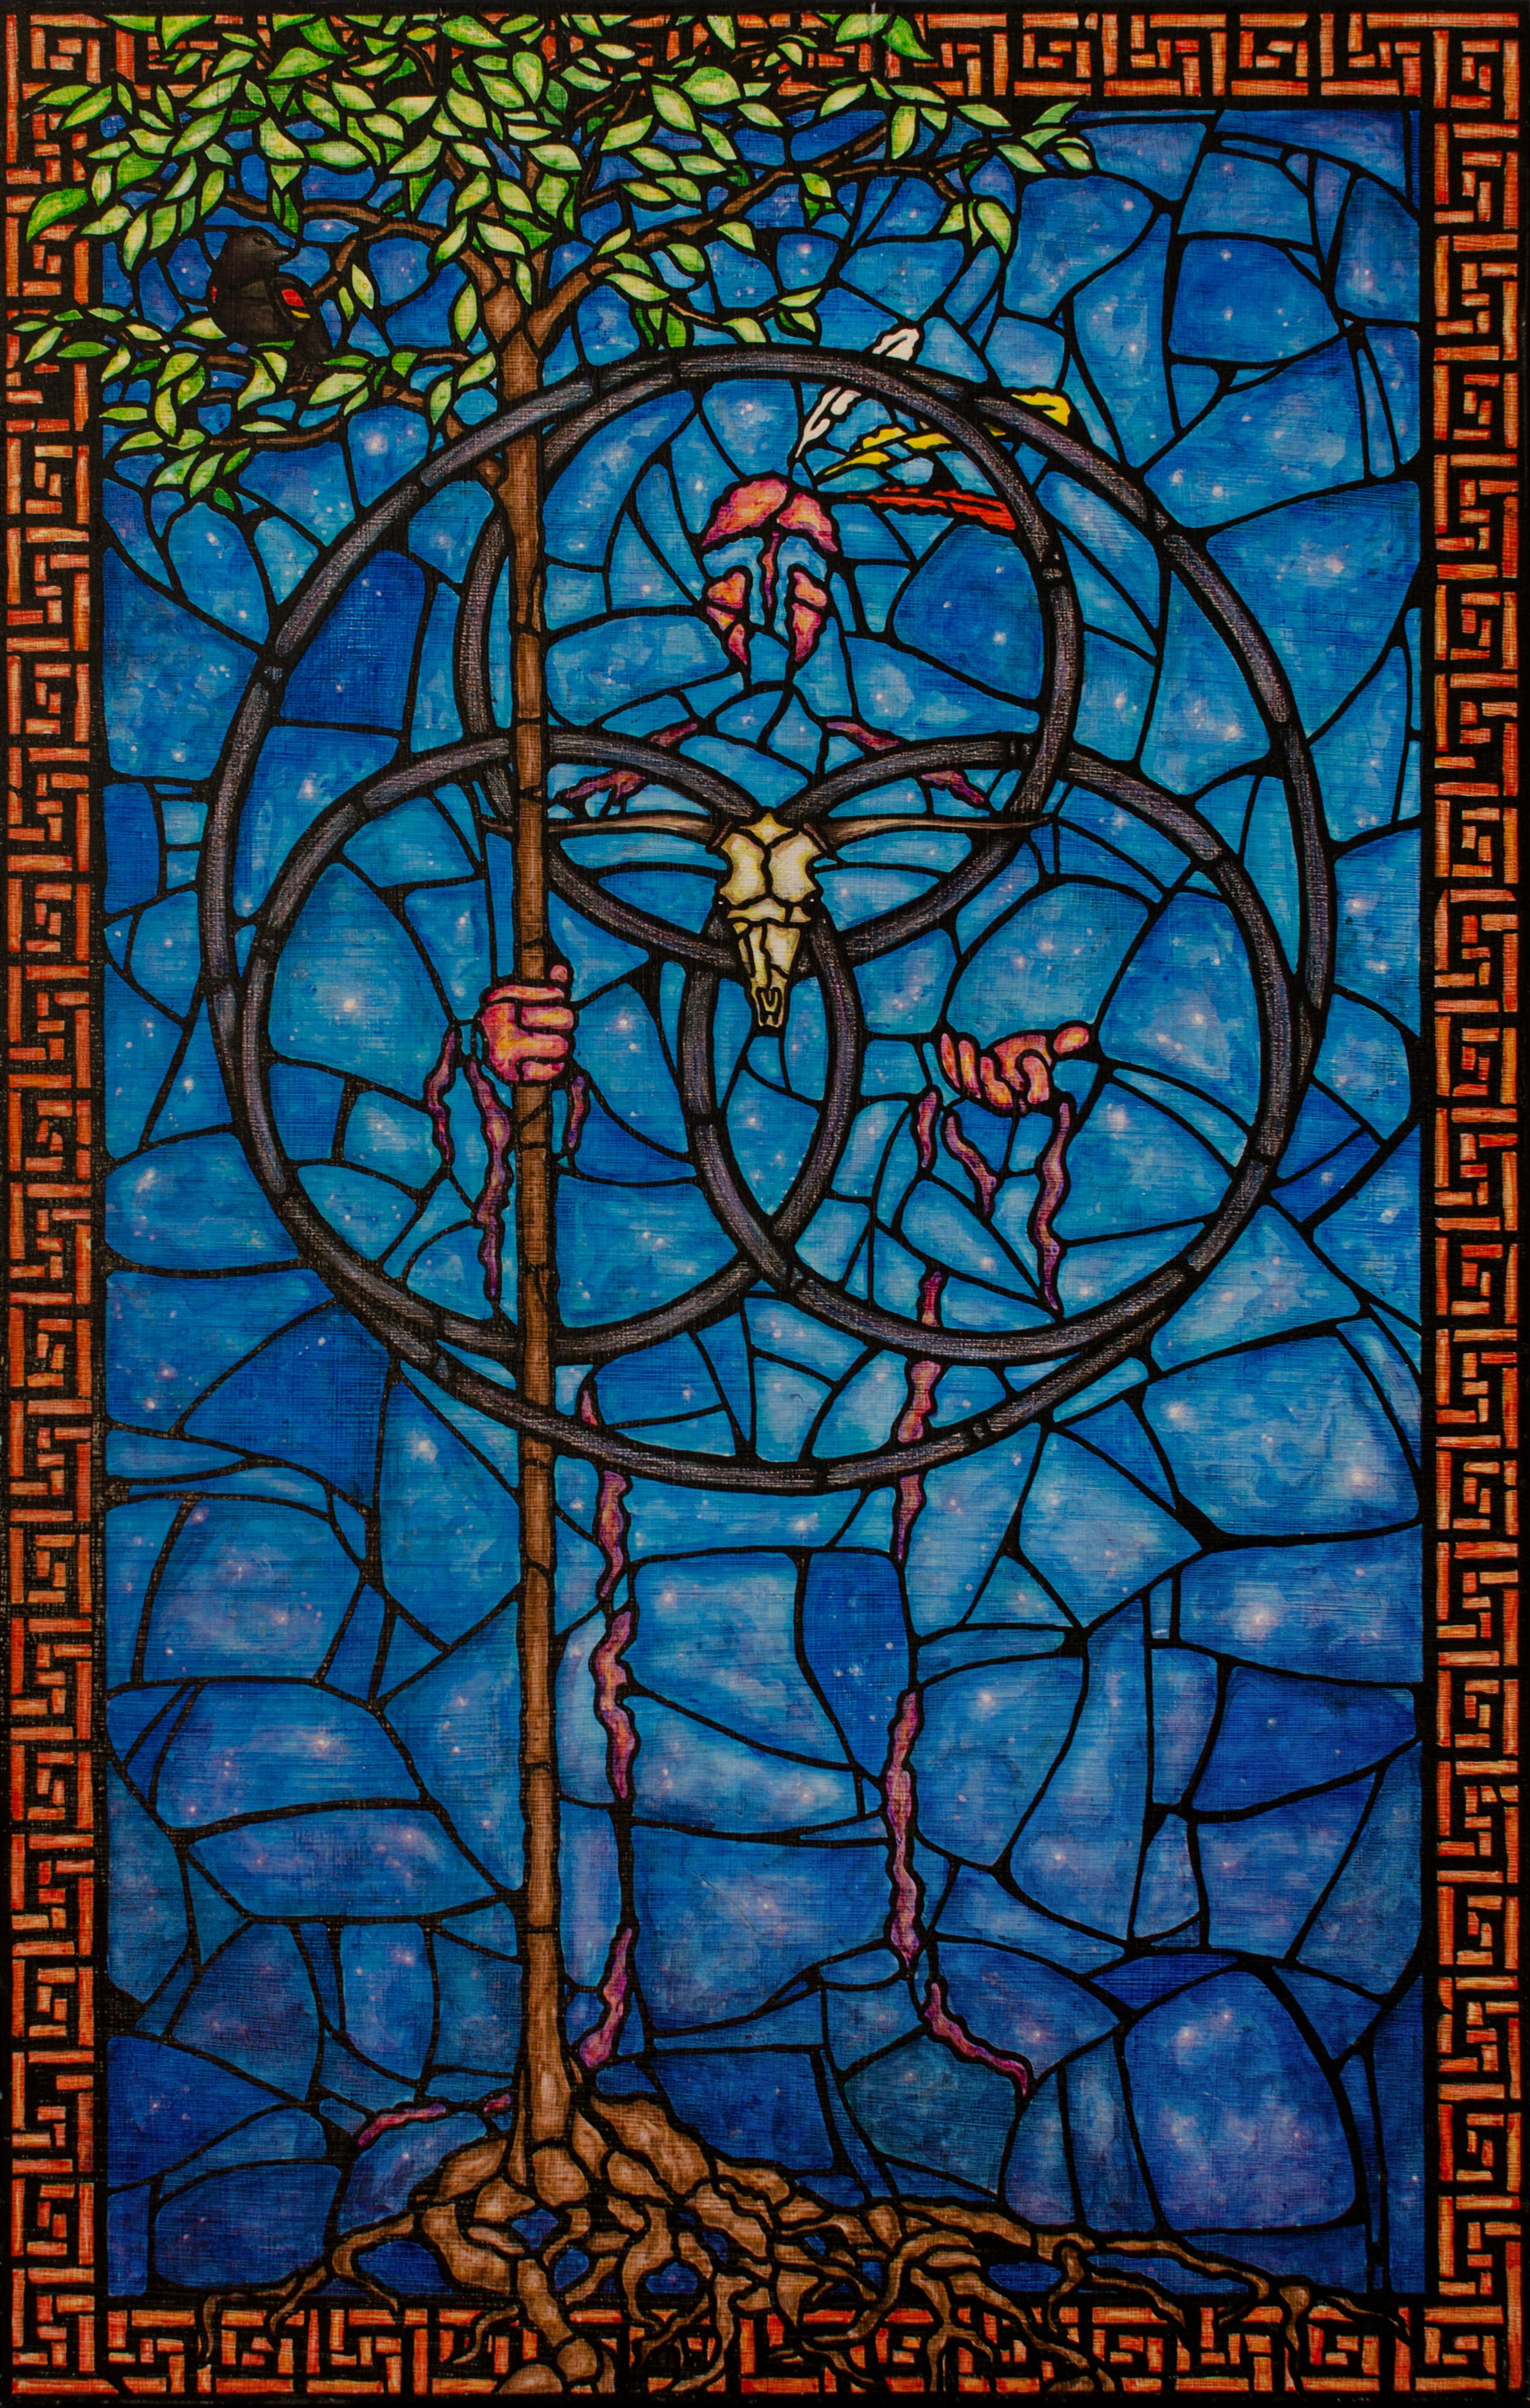 V. Communion/Hierophant